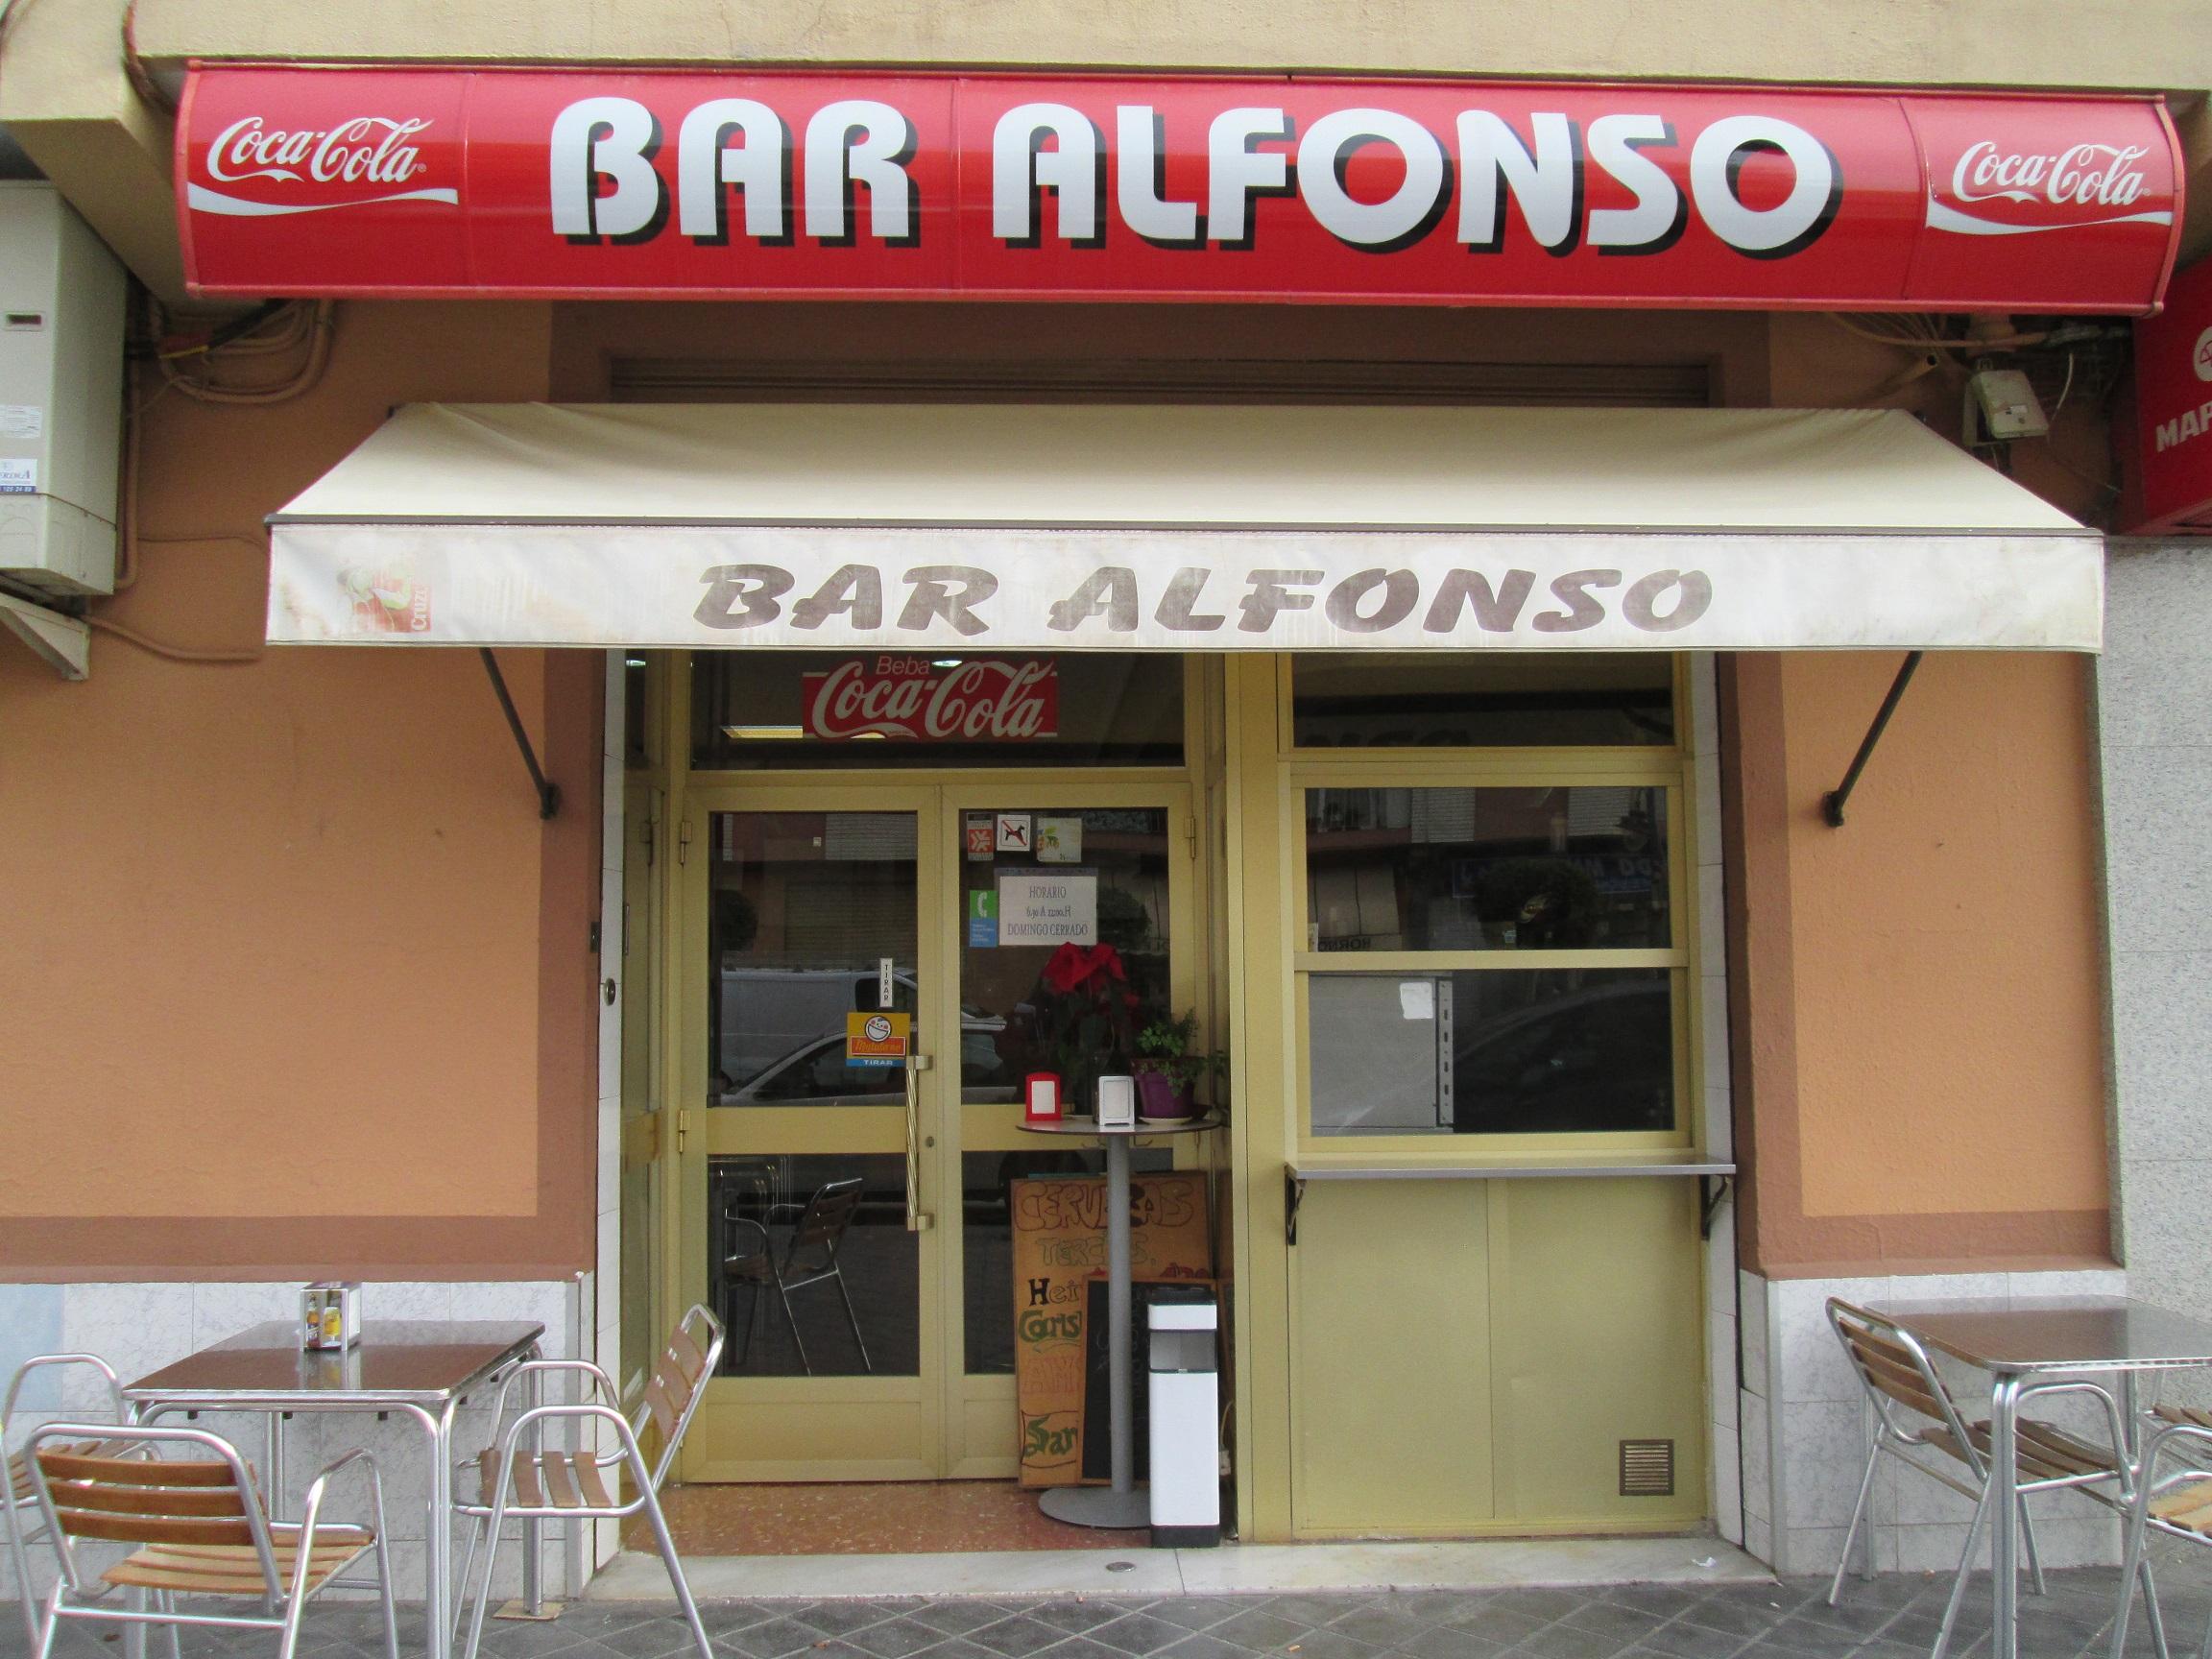 Bar Alfonso